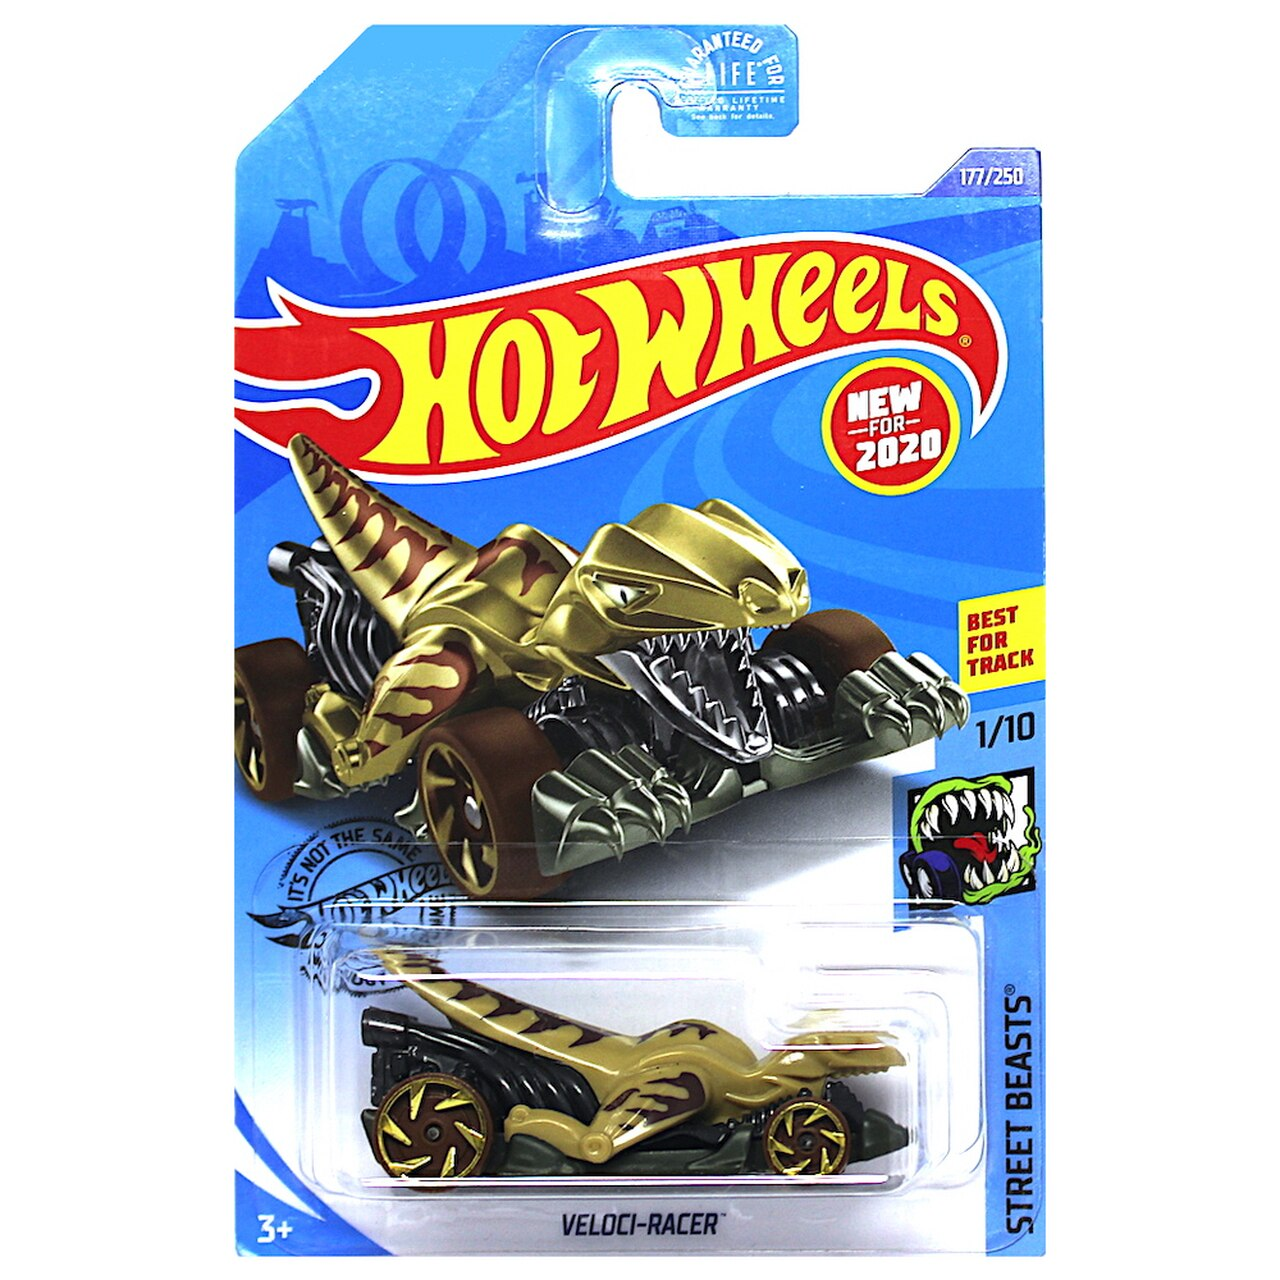 Carrinho Hot Wheels Veloci-Racer (MXLIC) Street Beasts - Mattel